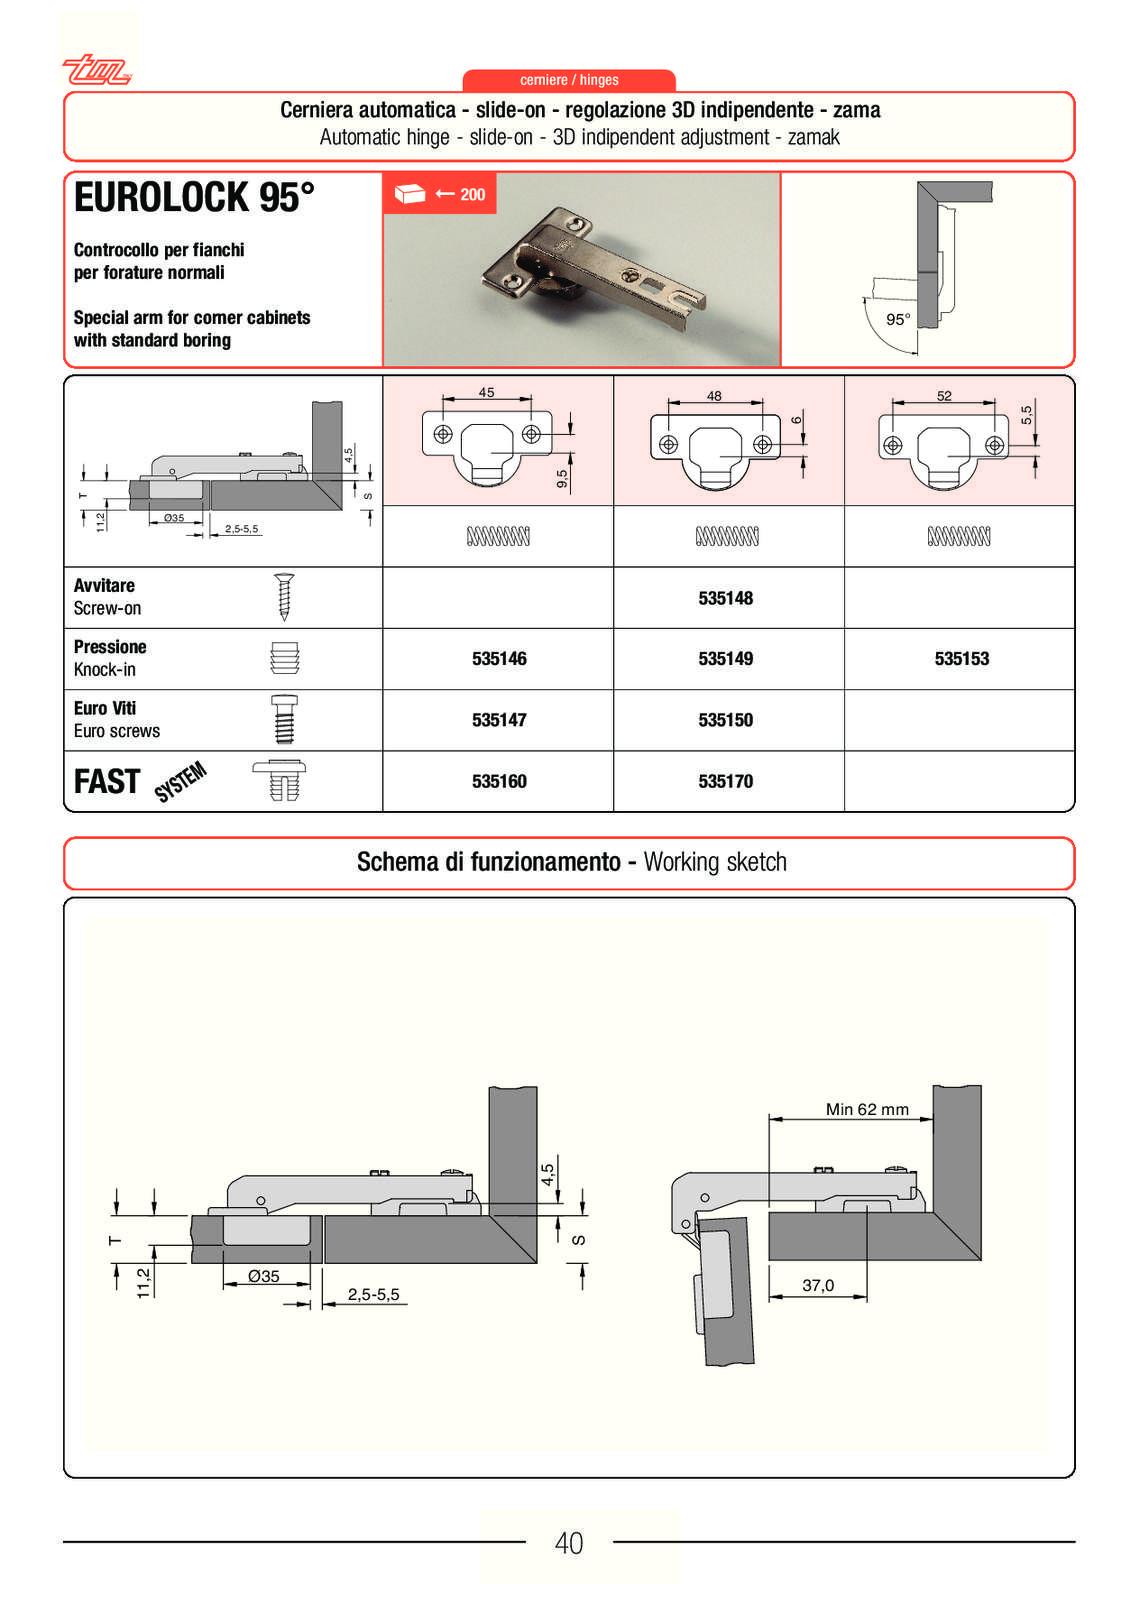 euro-hinges-catalogue_175_039.jpg